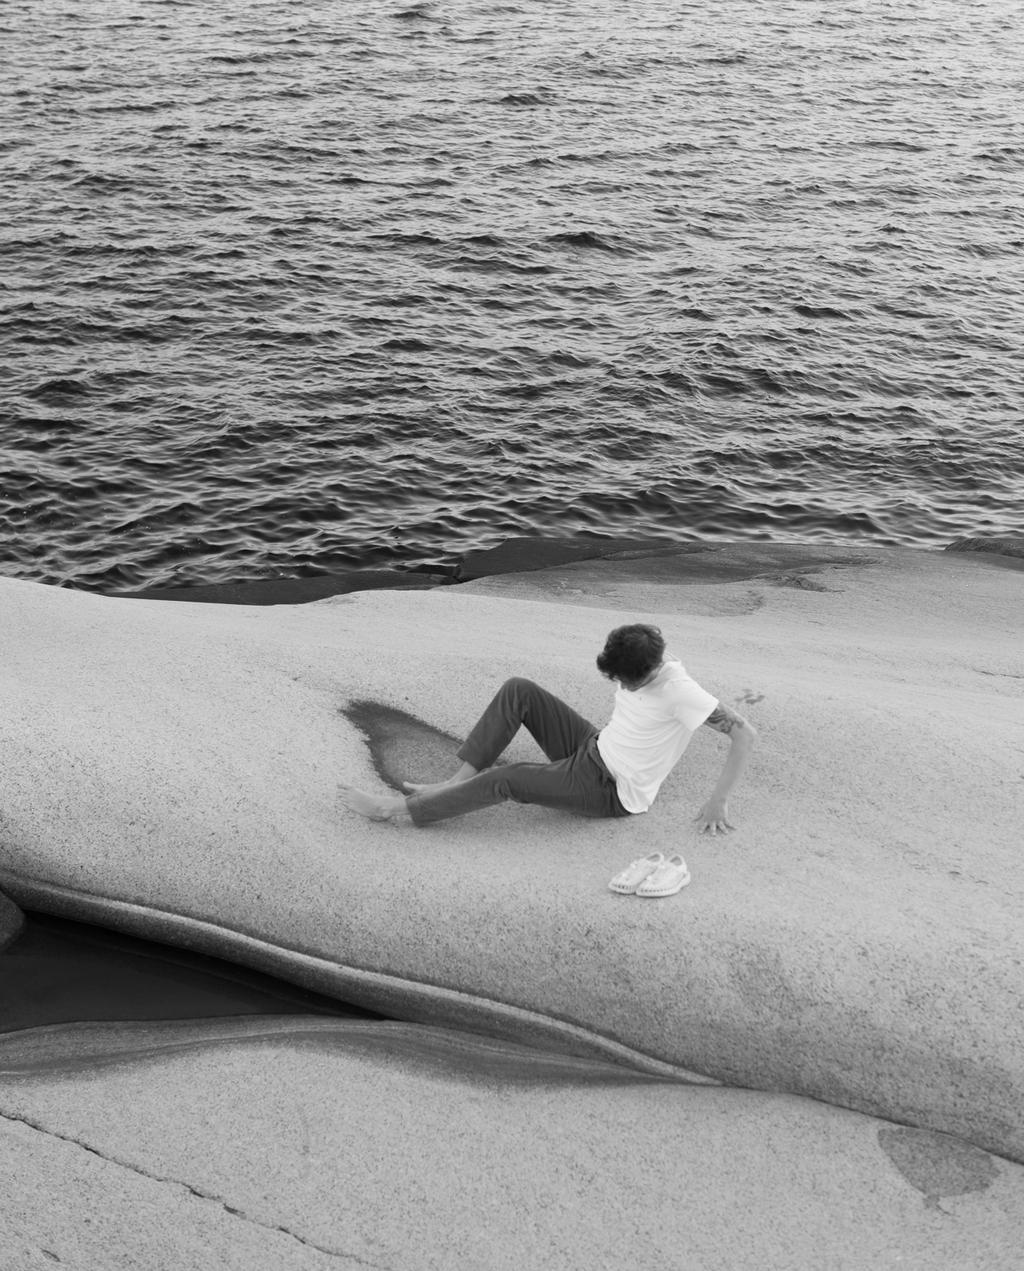 vtwonen | Blog StudentDesign Jonas Carlsen & Gard Hagen